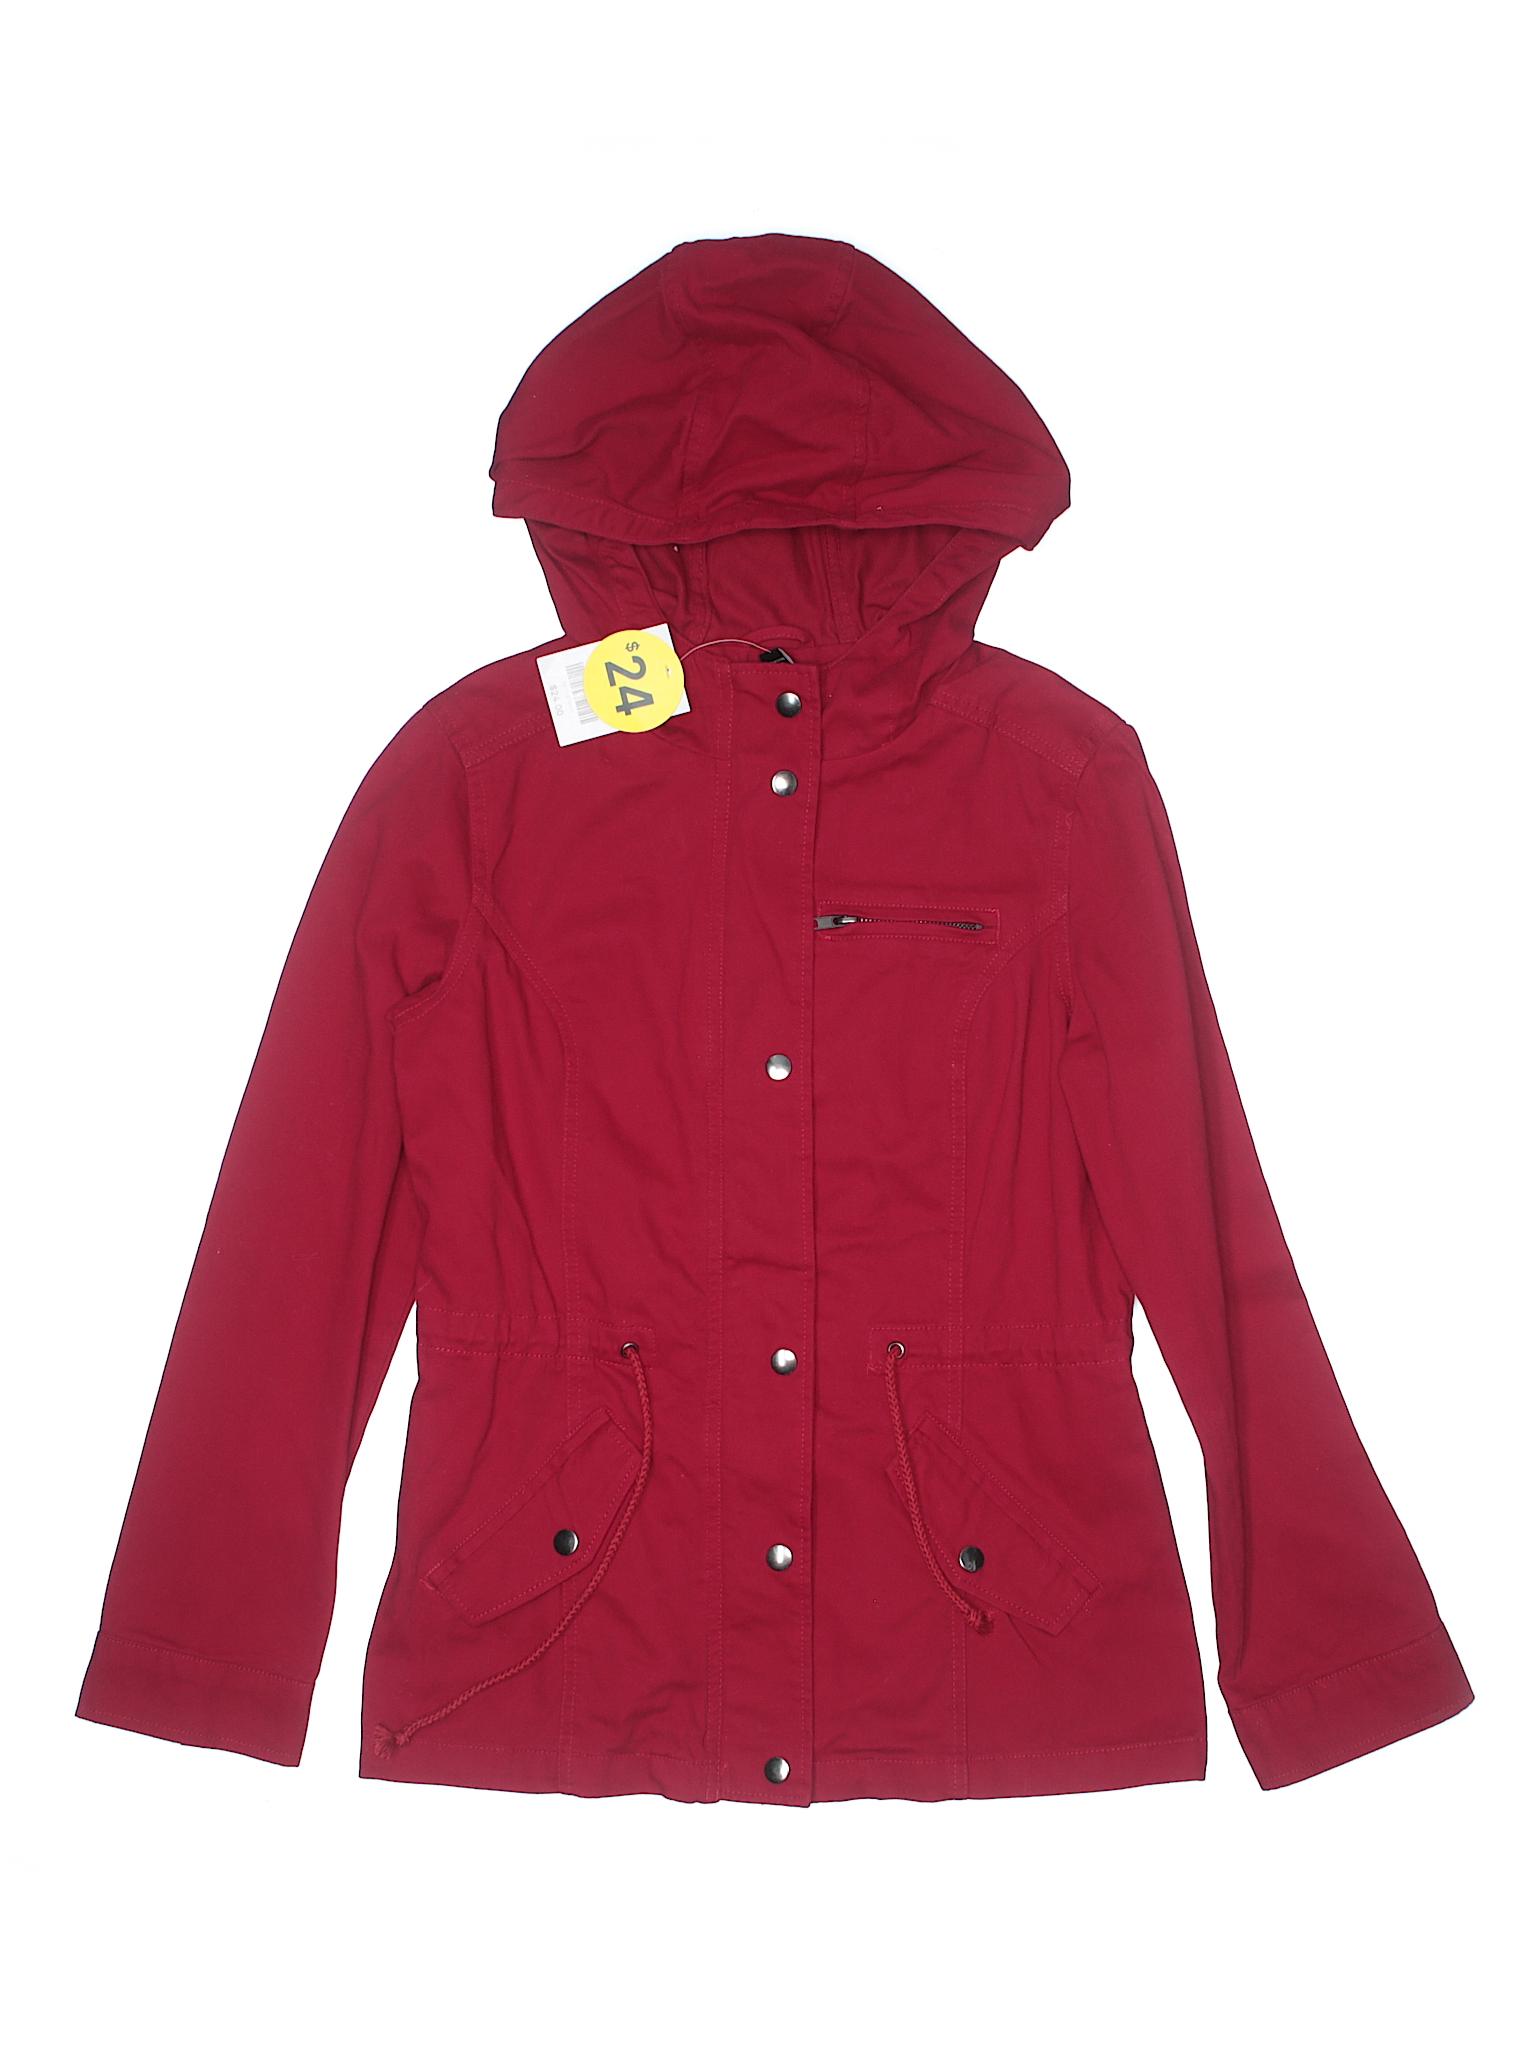 Forever Boutique Jacket 21 Boutique Forever 8B1HOO